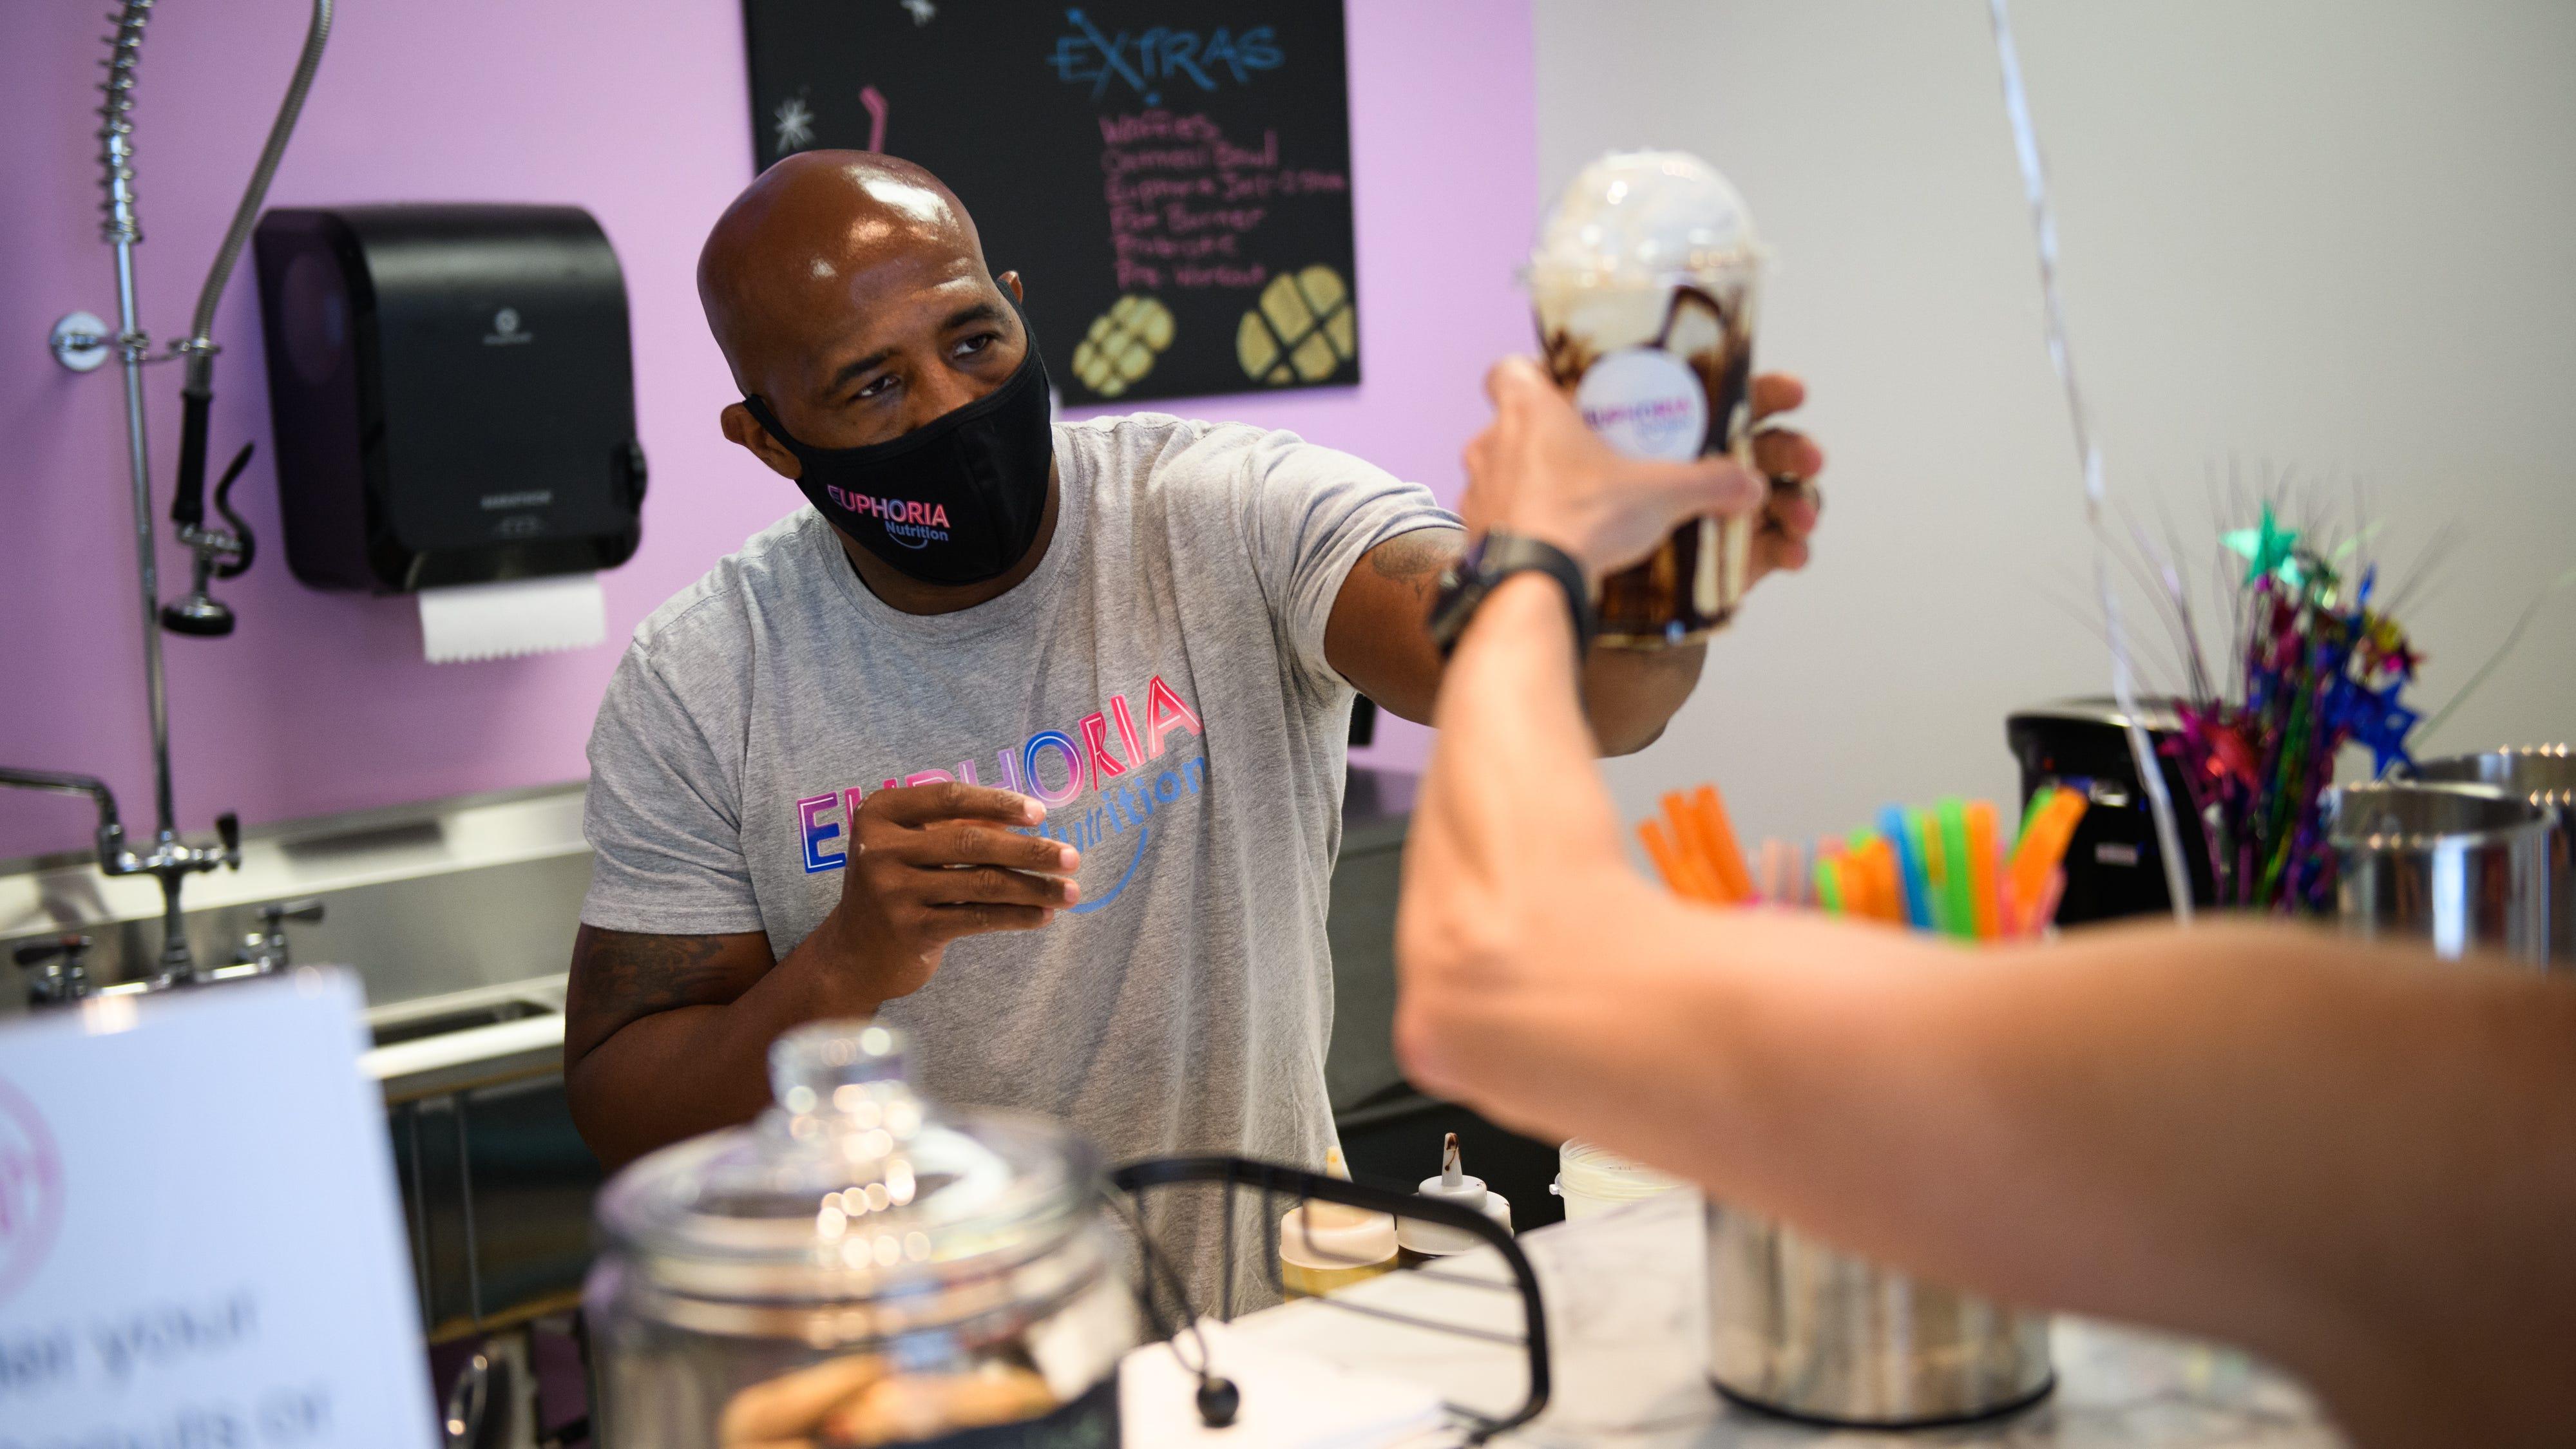 Everitt Willamson hands a shake to a customer at Euphoria Nutrition on Friday, Aug. 7, 2020.